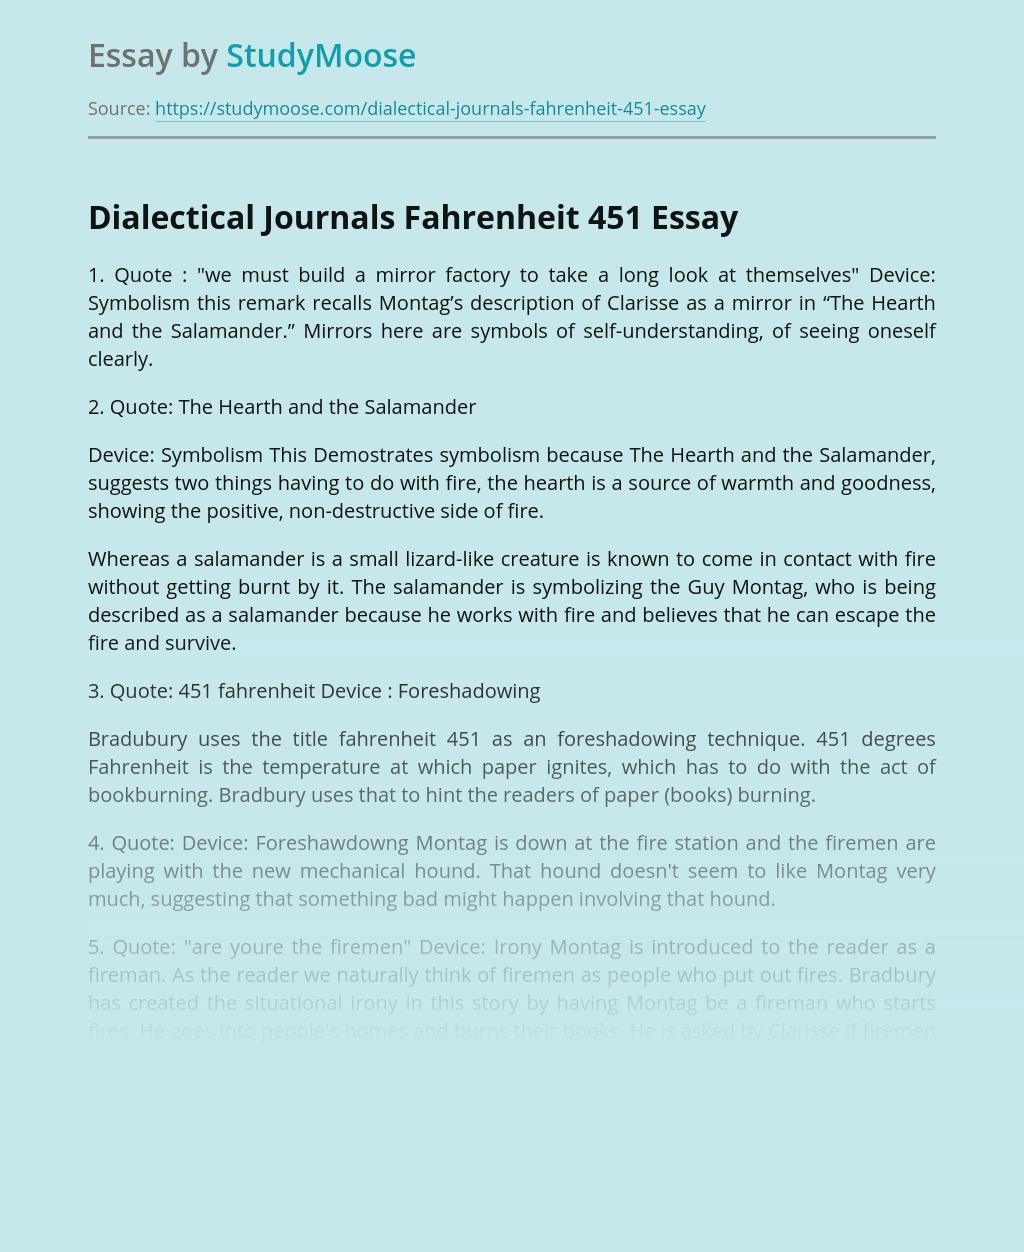 Dialectical Journals Fahrenheit 451